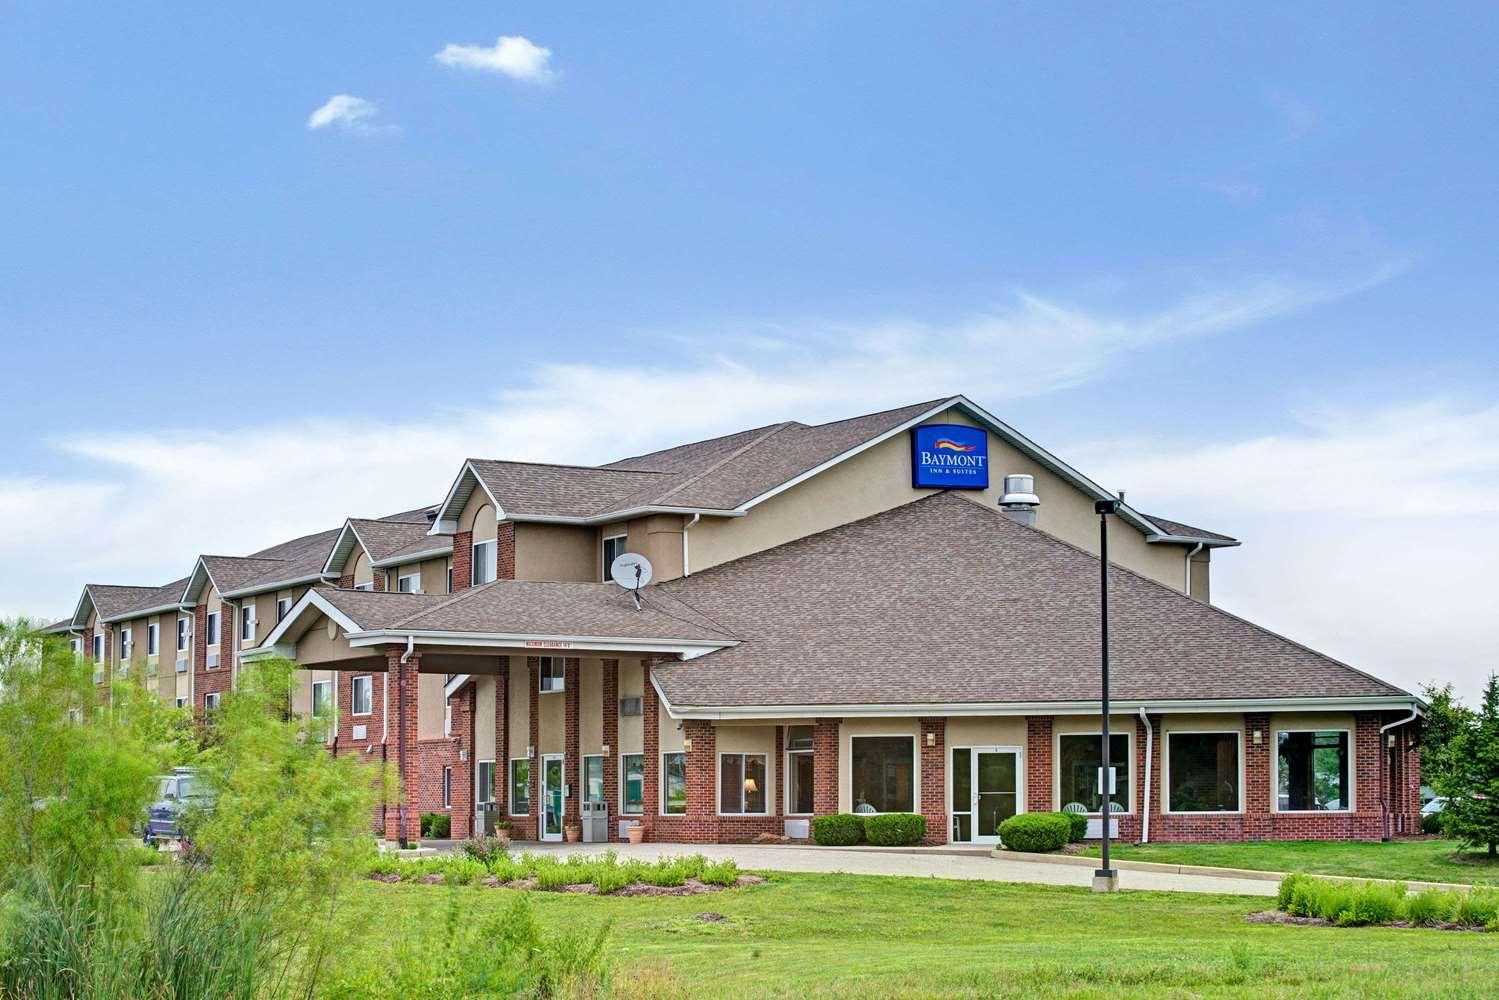 Exterior view - Baymont Inn & Suites Indianapolis